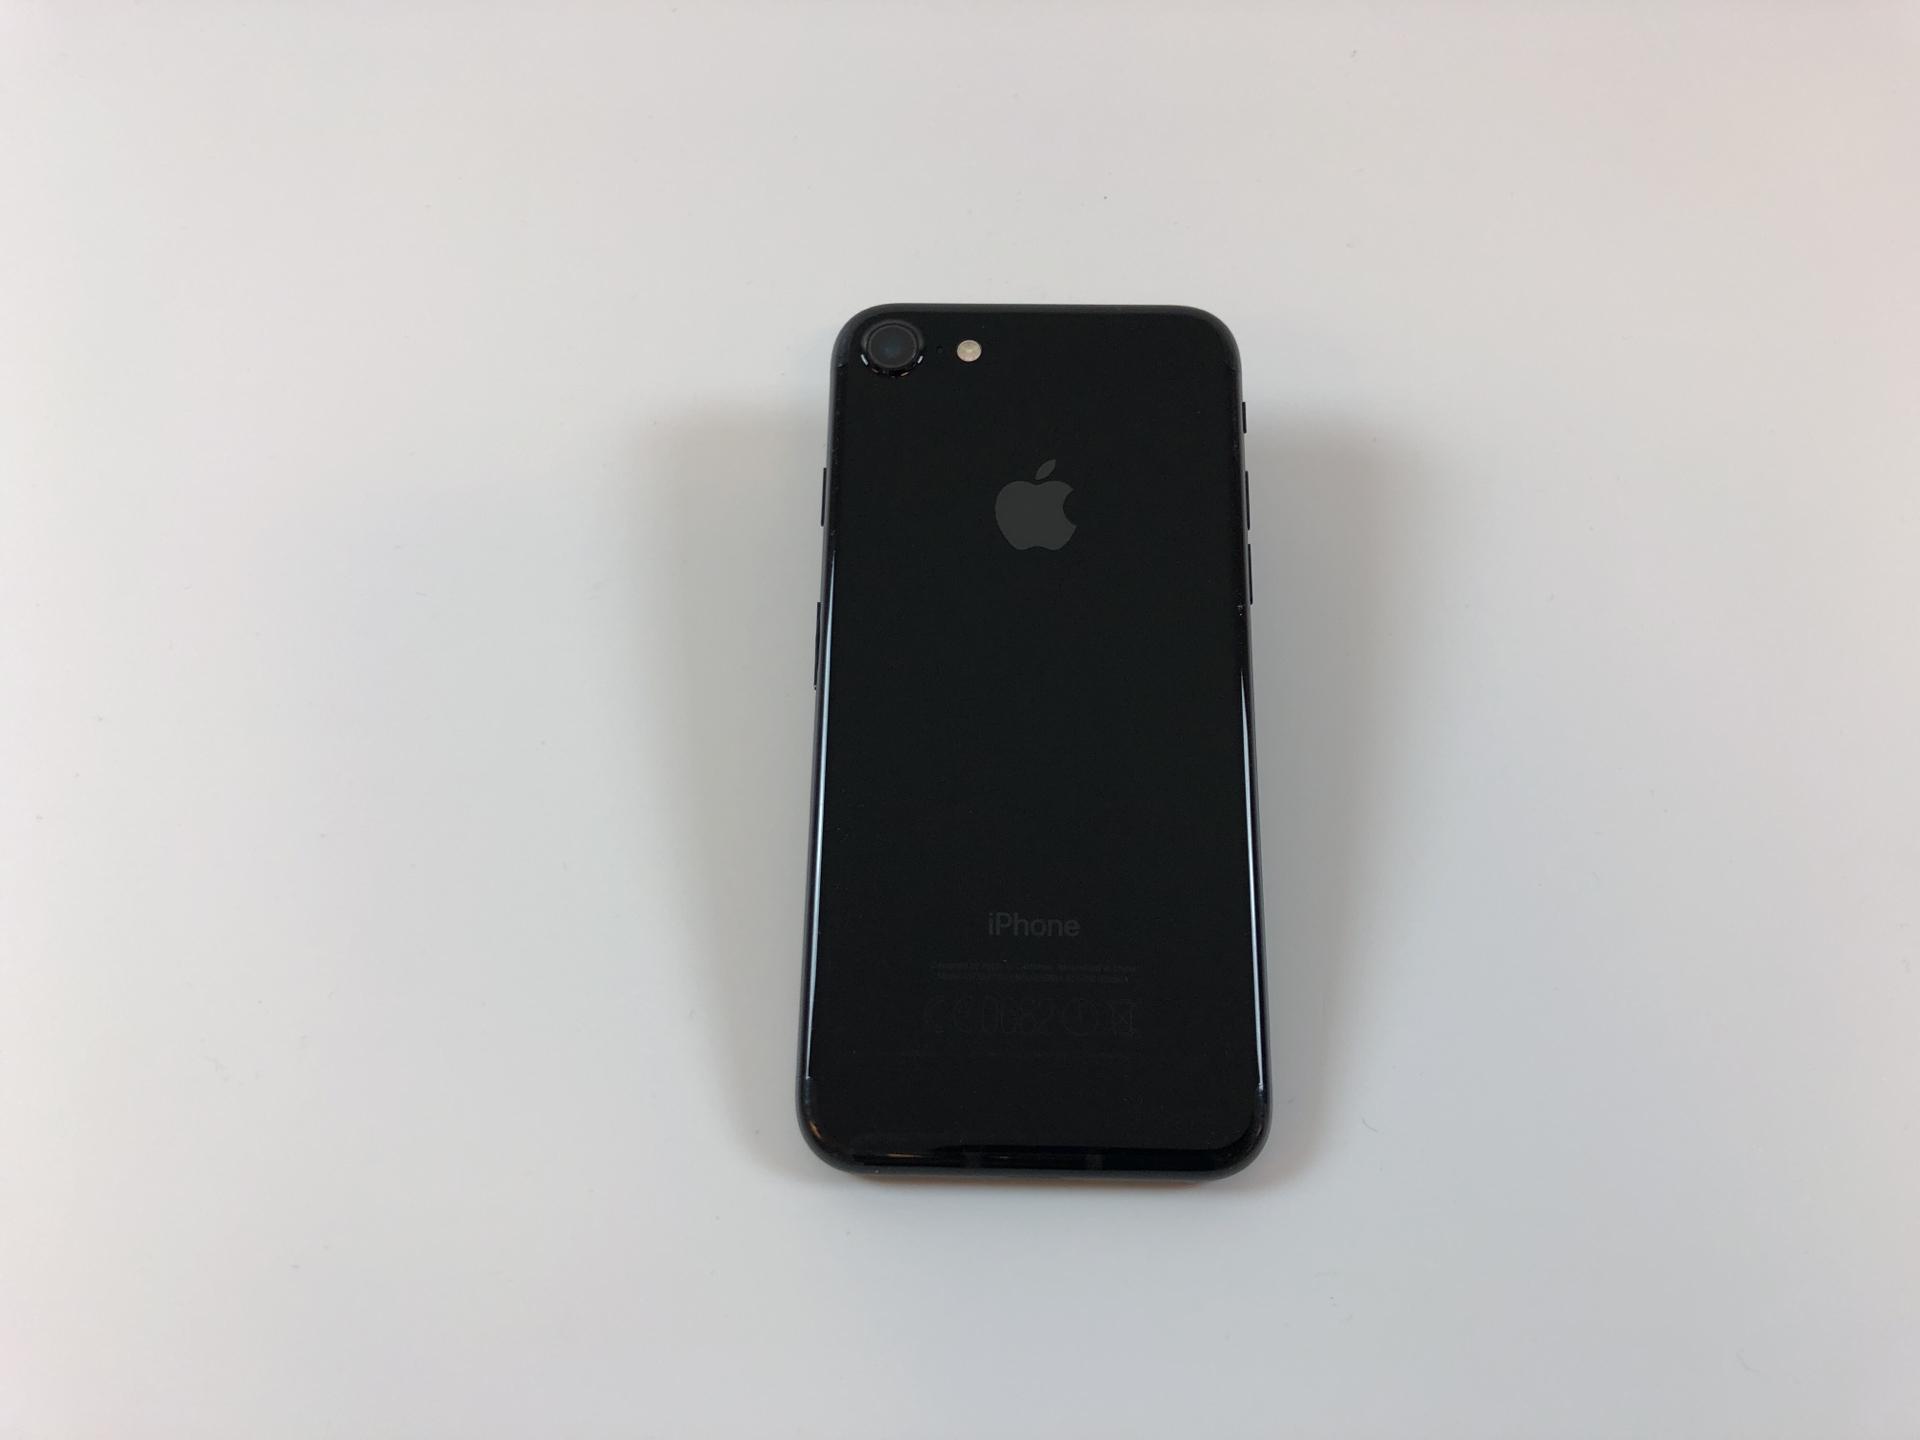 iPhone 7 128GB, 128GB, Jet Black, Kuva 2